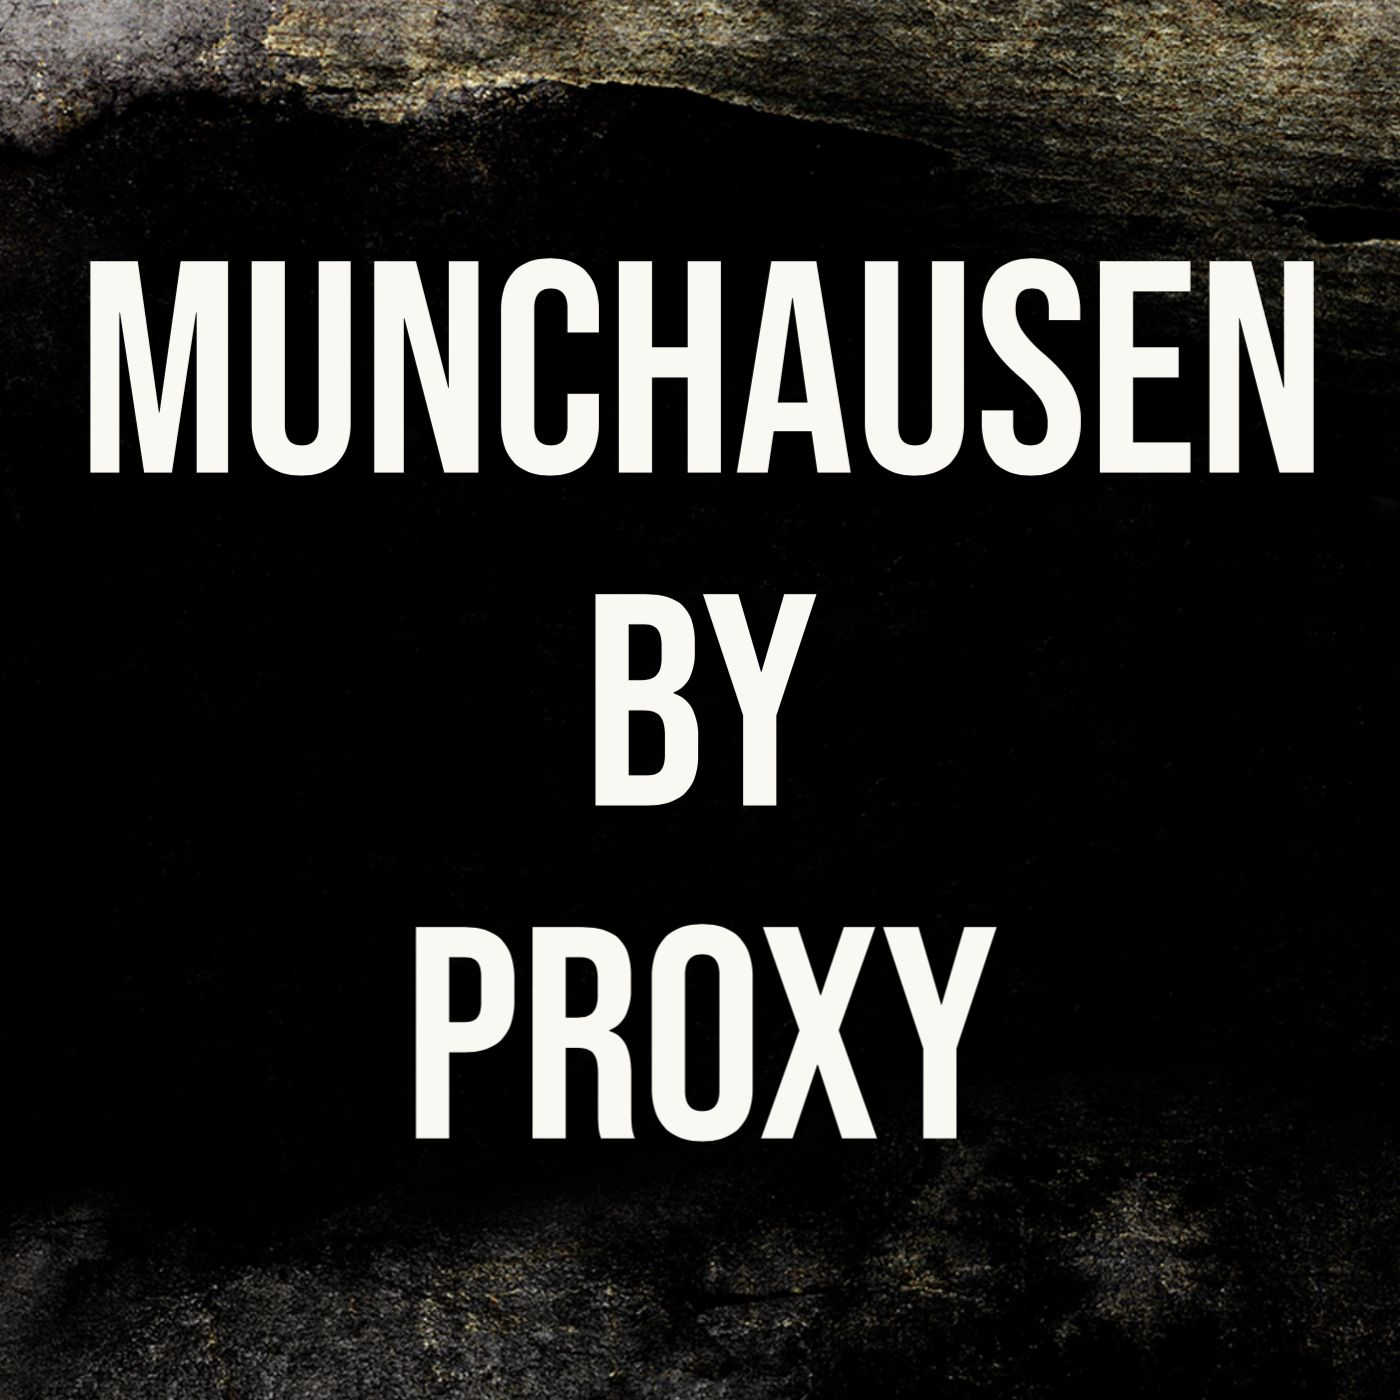 Munchausen By Proxy (2017 Rerun)